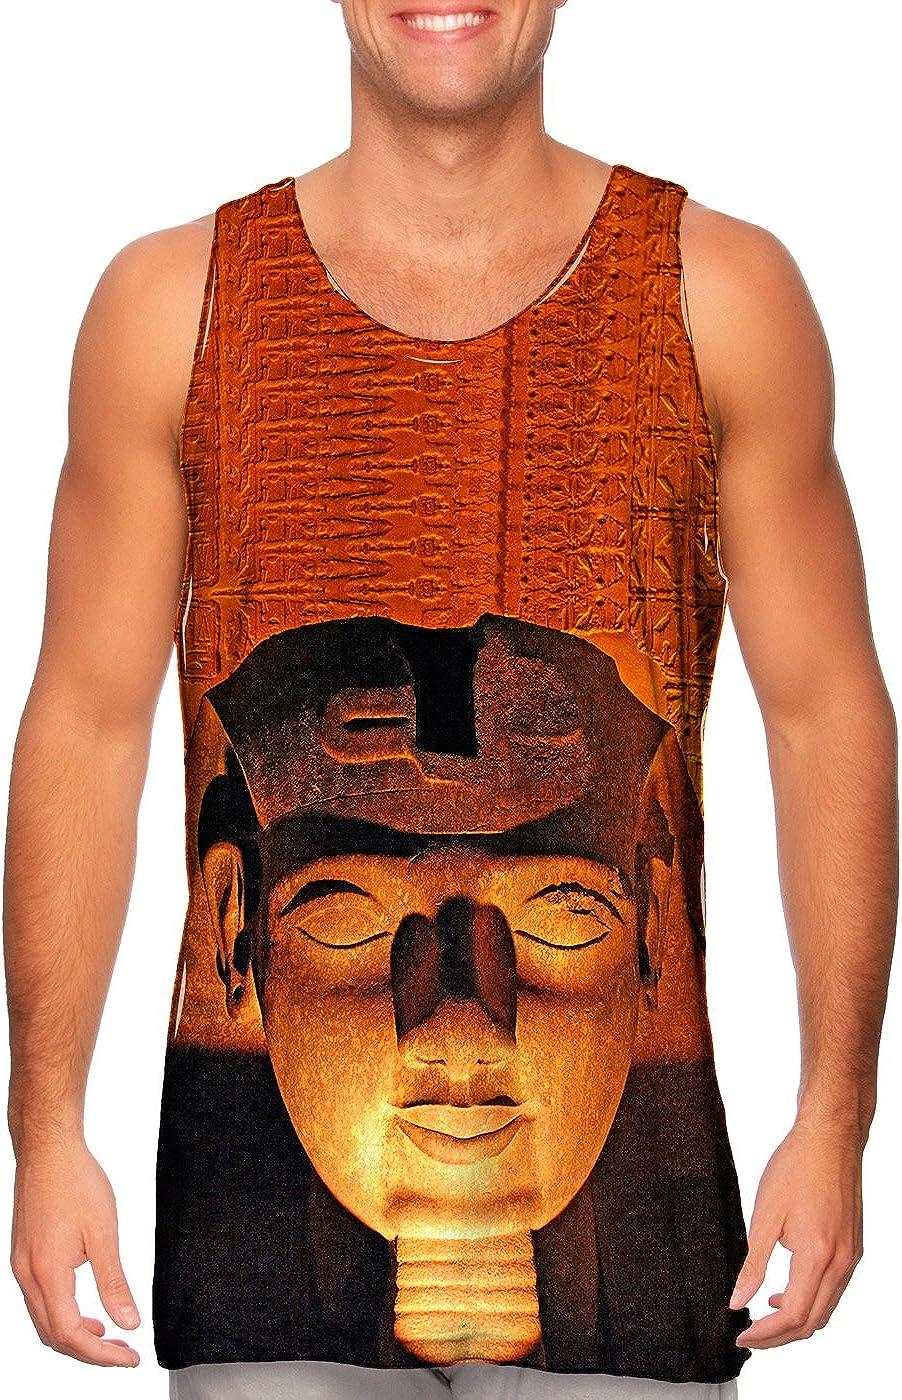 Oakland Ranking TOP1 Mall Yizzam- Egyptian Statue -Tshirt- Tank Mens Top